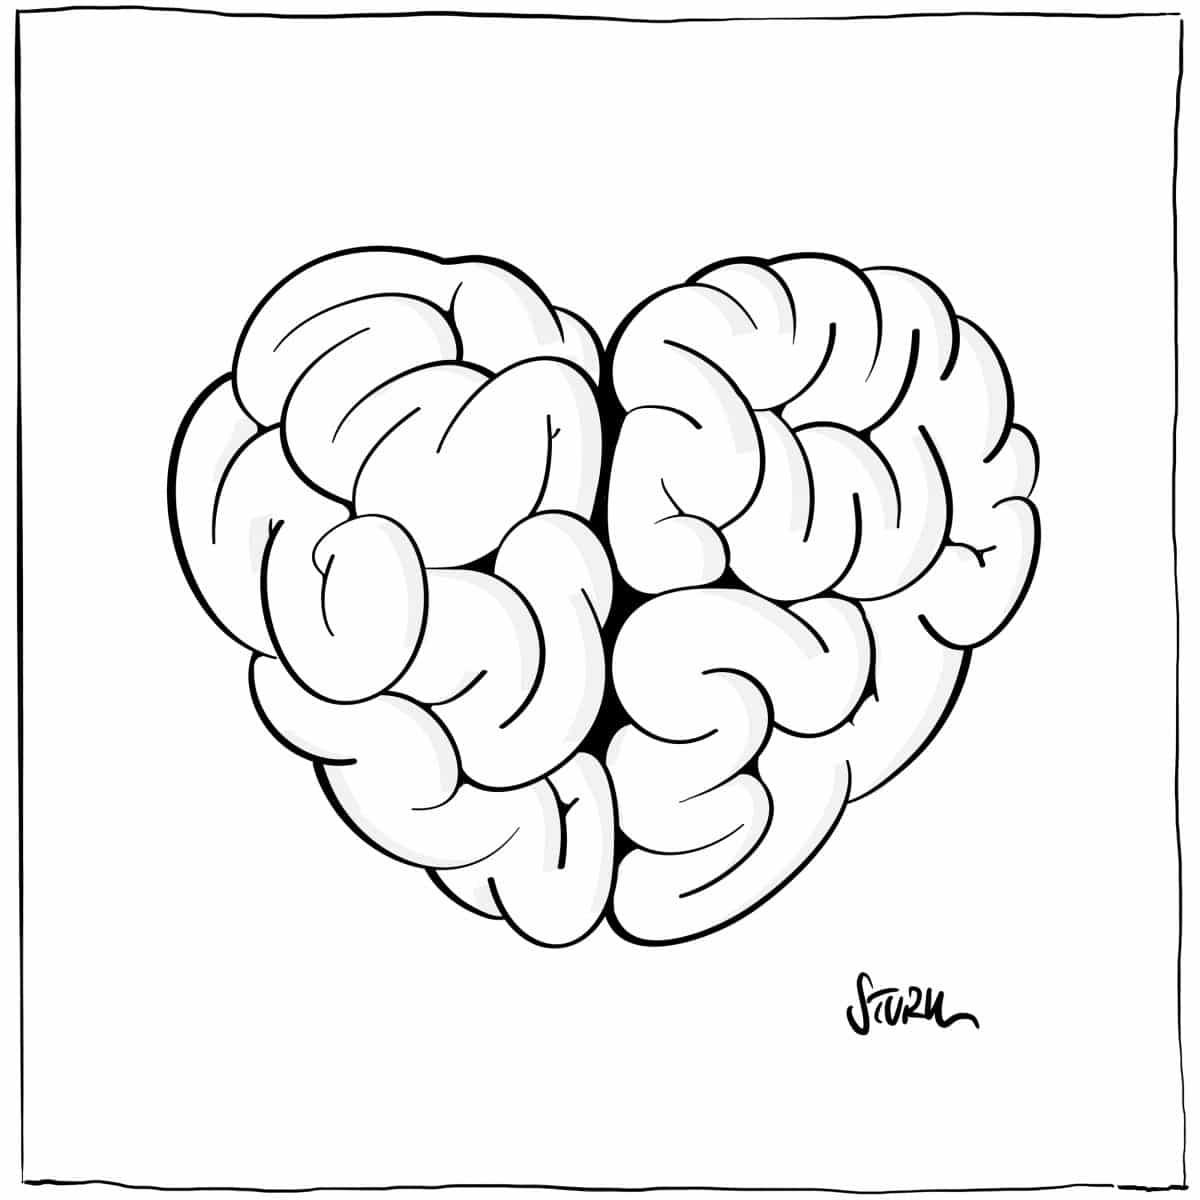 Betterbrain –Graphic by Philipp Sturm